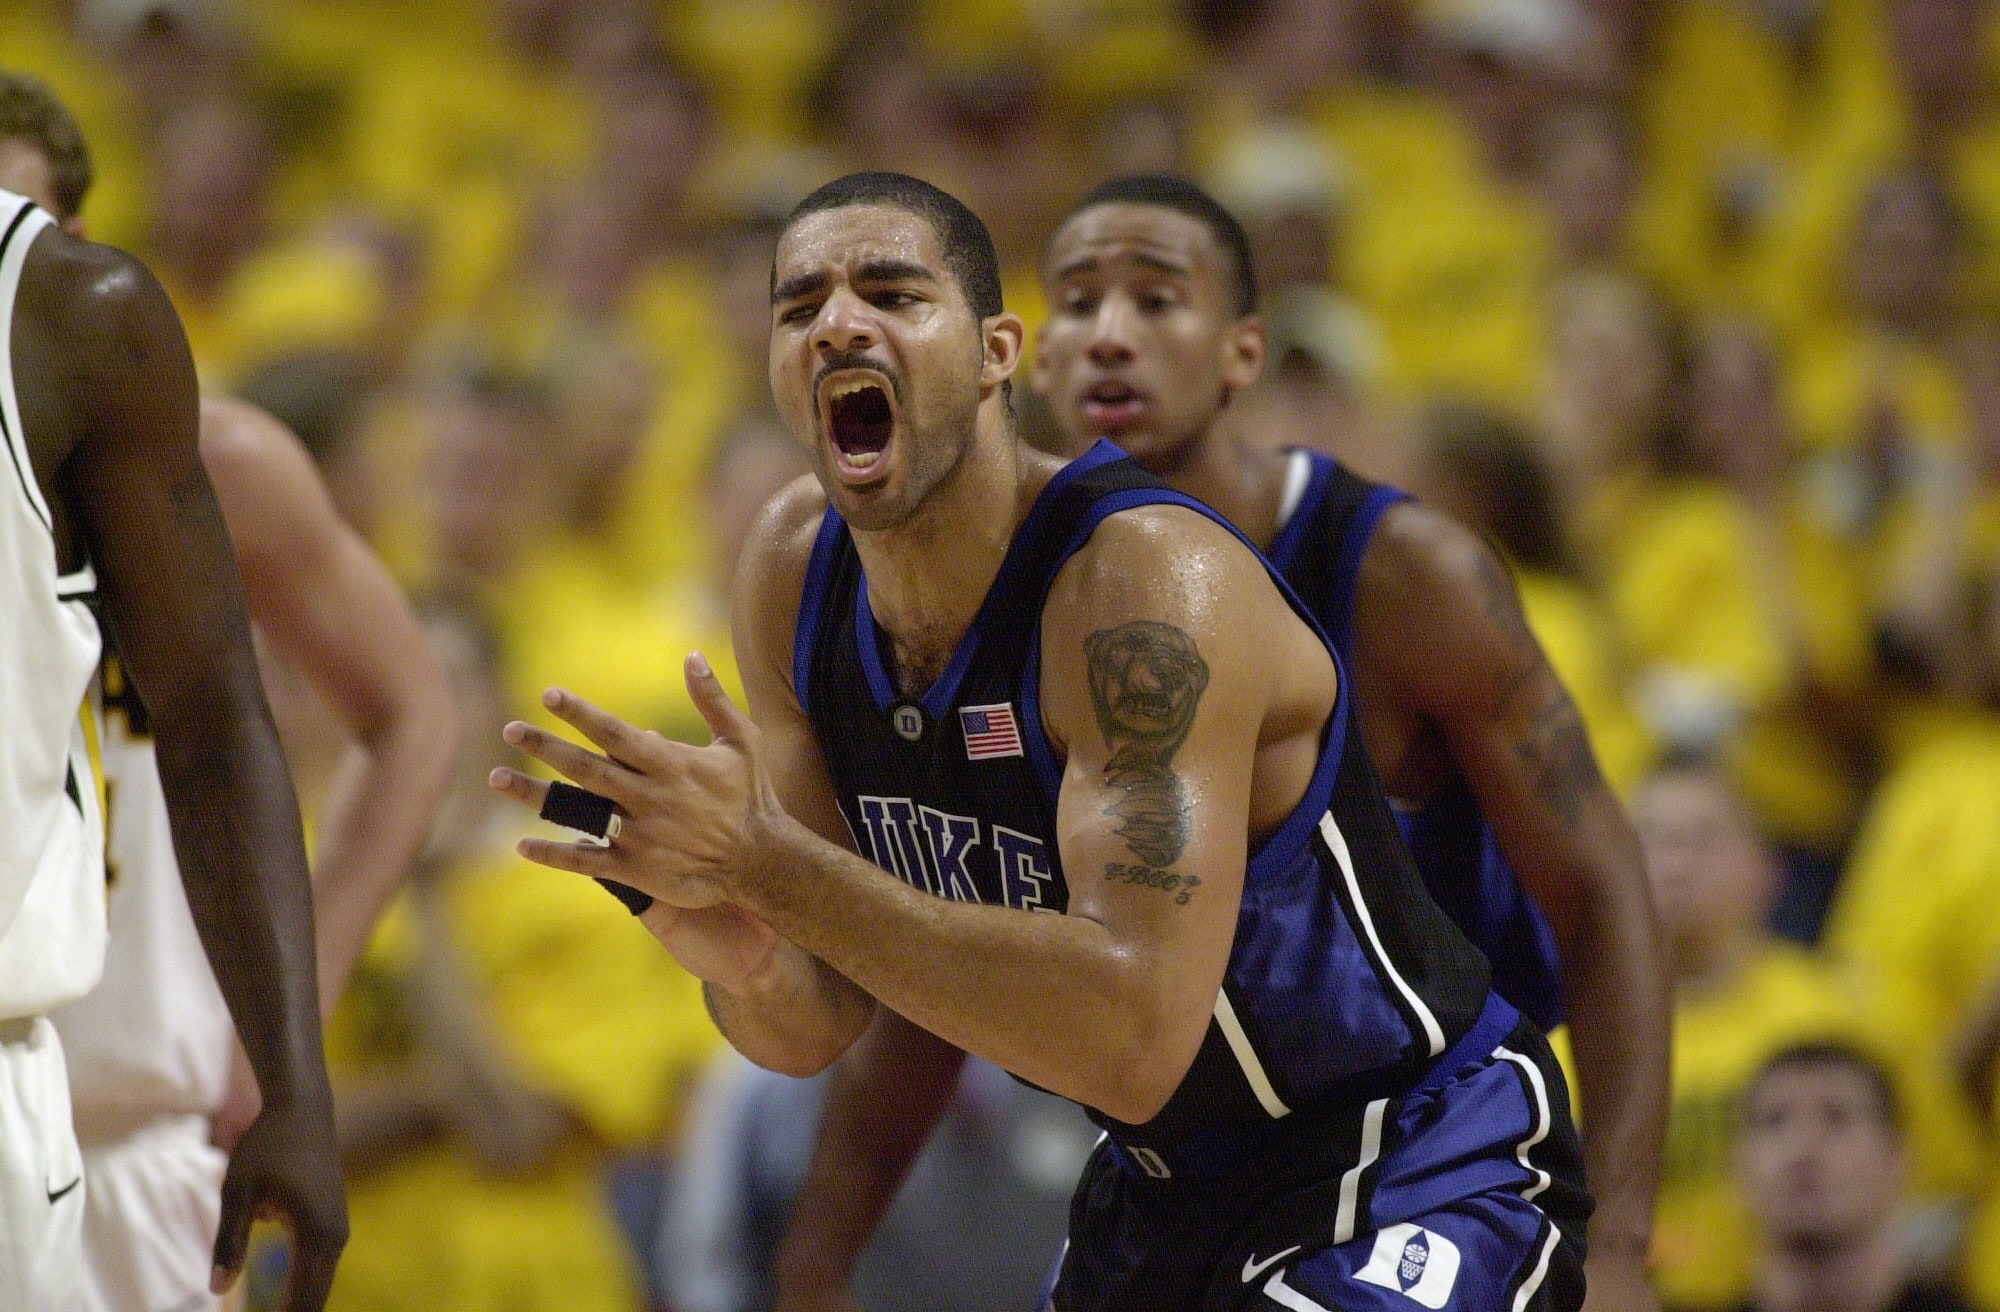 Duke basketball: Son of Blue Devils legend growing into top recruit